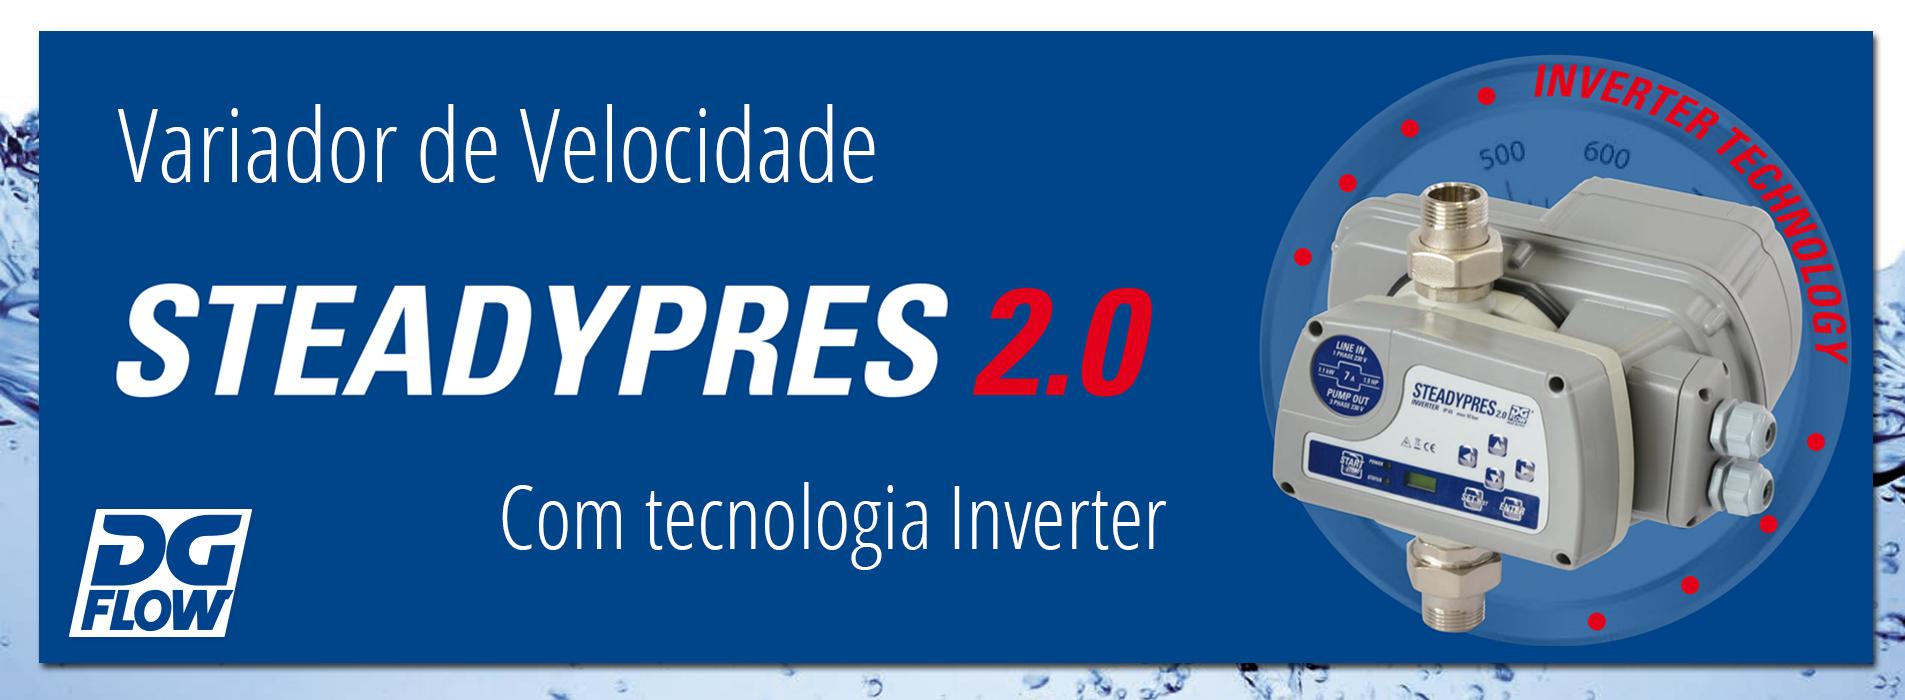 Steadypres 2.0